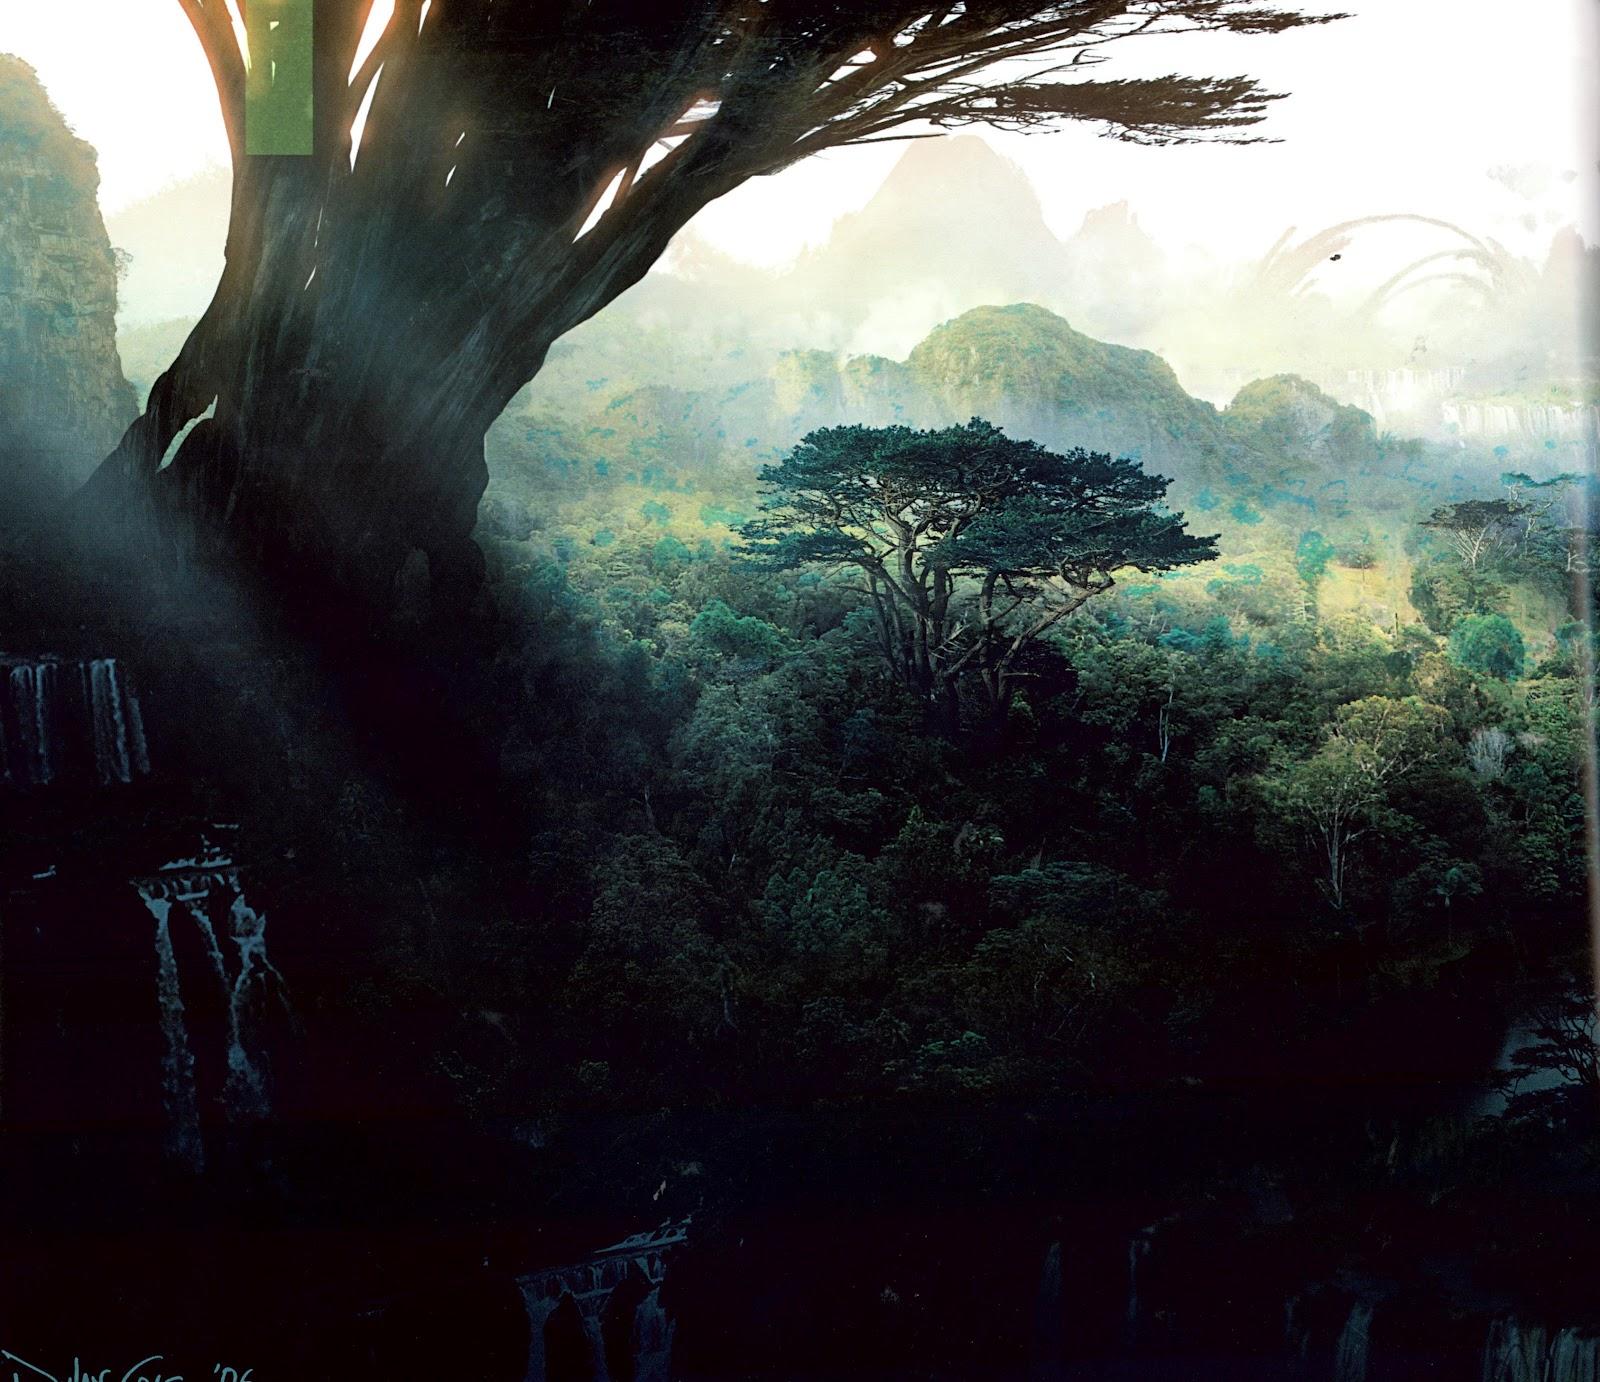 Avatar Pandora Landscape: Chris Mason: MA Design For Film, Television & Events: Film